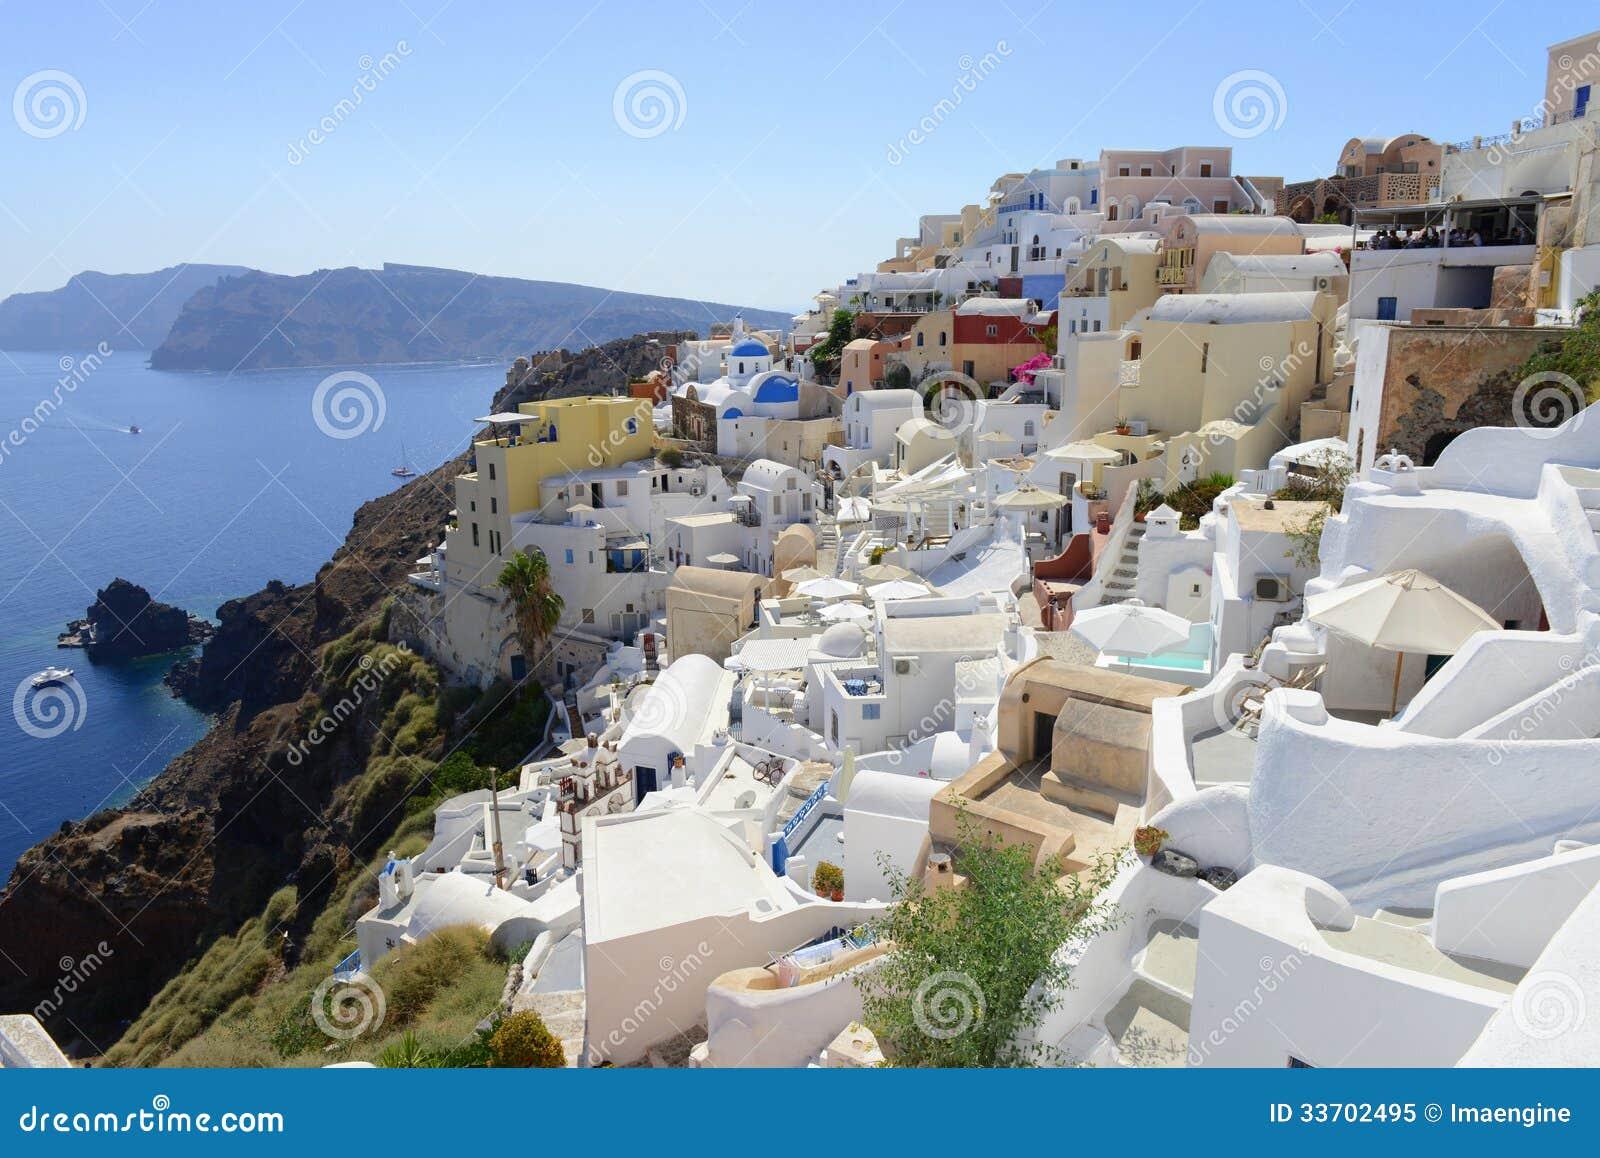 Oia Santorini Thira Greece View Over Caldera Stock